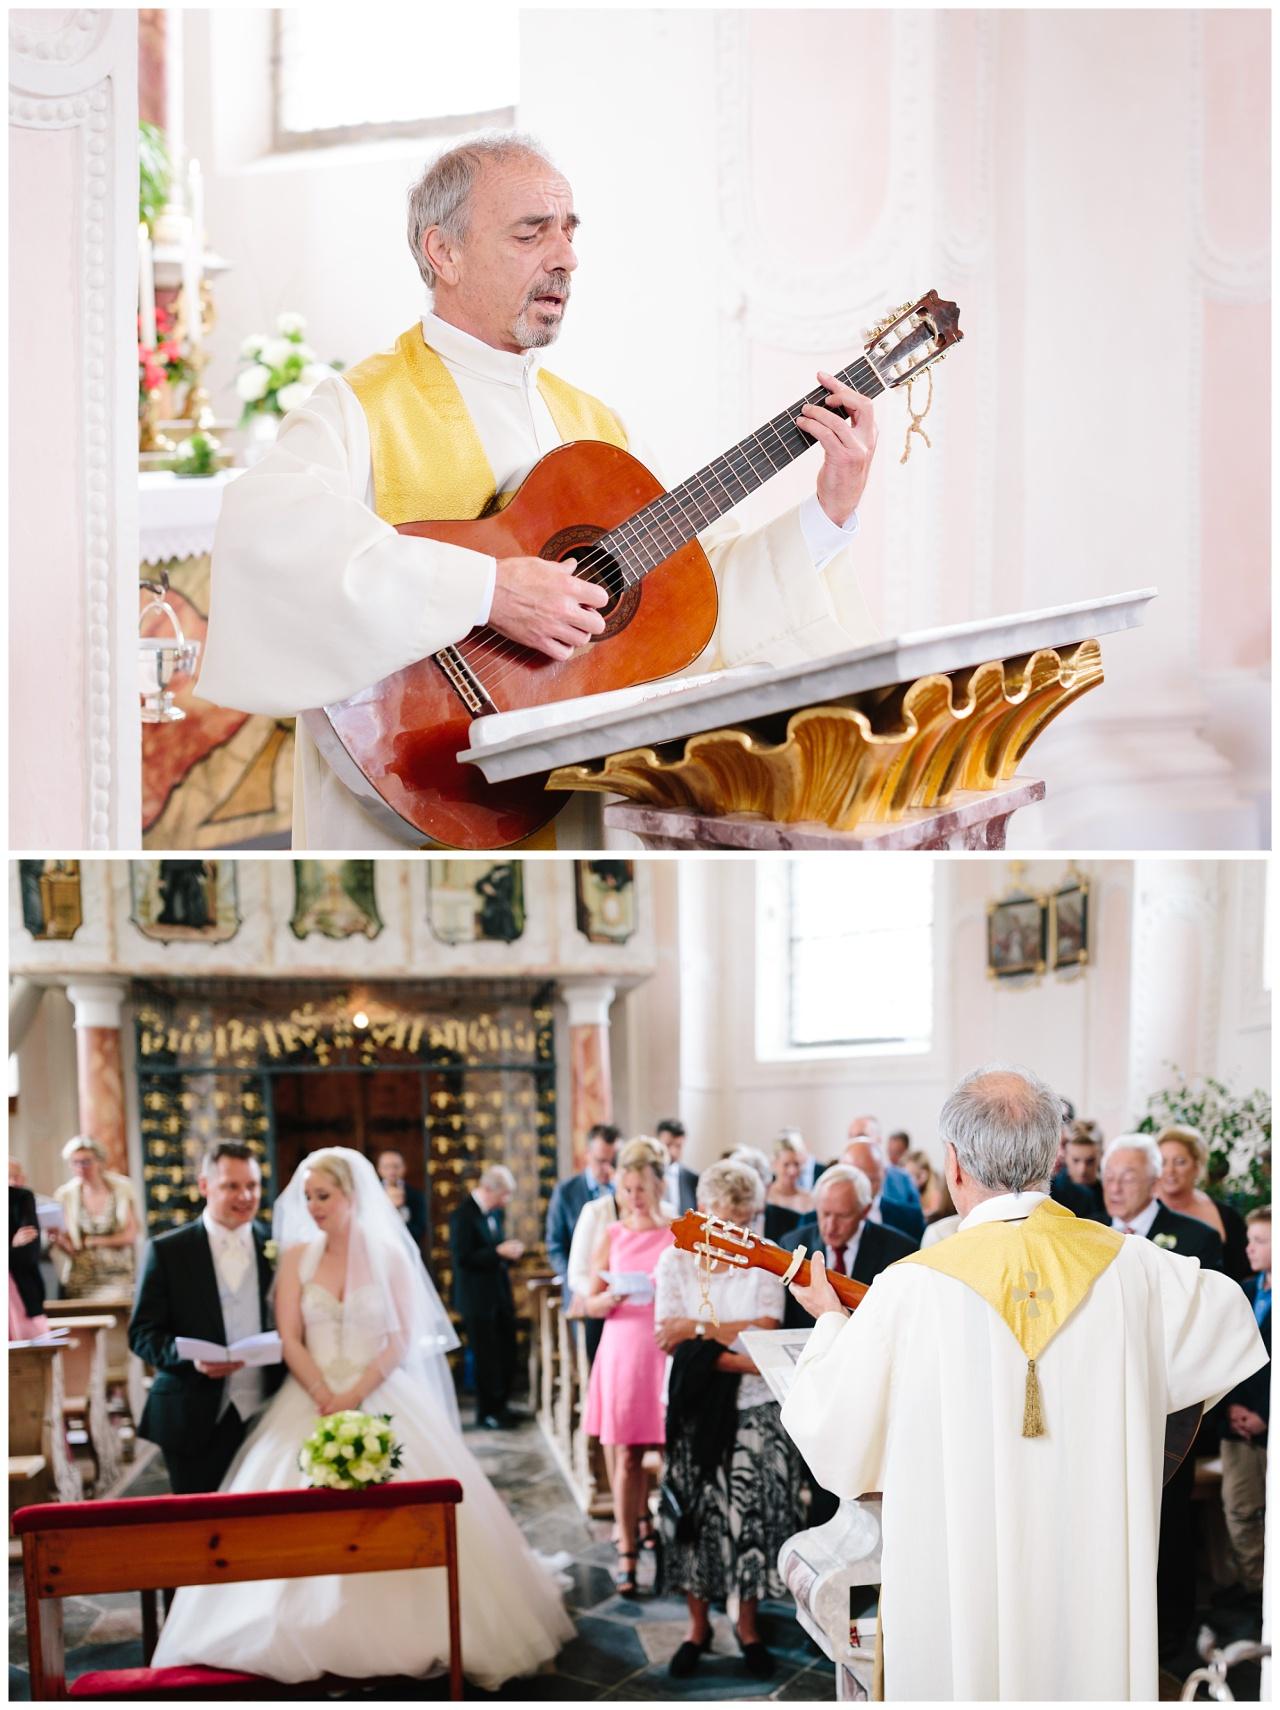 Hochzeitsfotograf Seefeld Triendlsaege 11